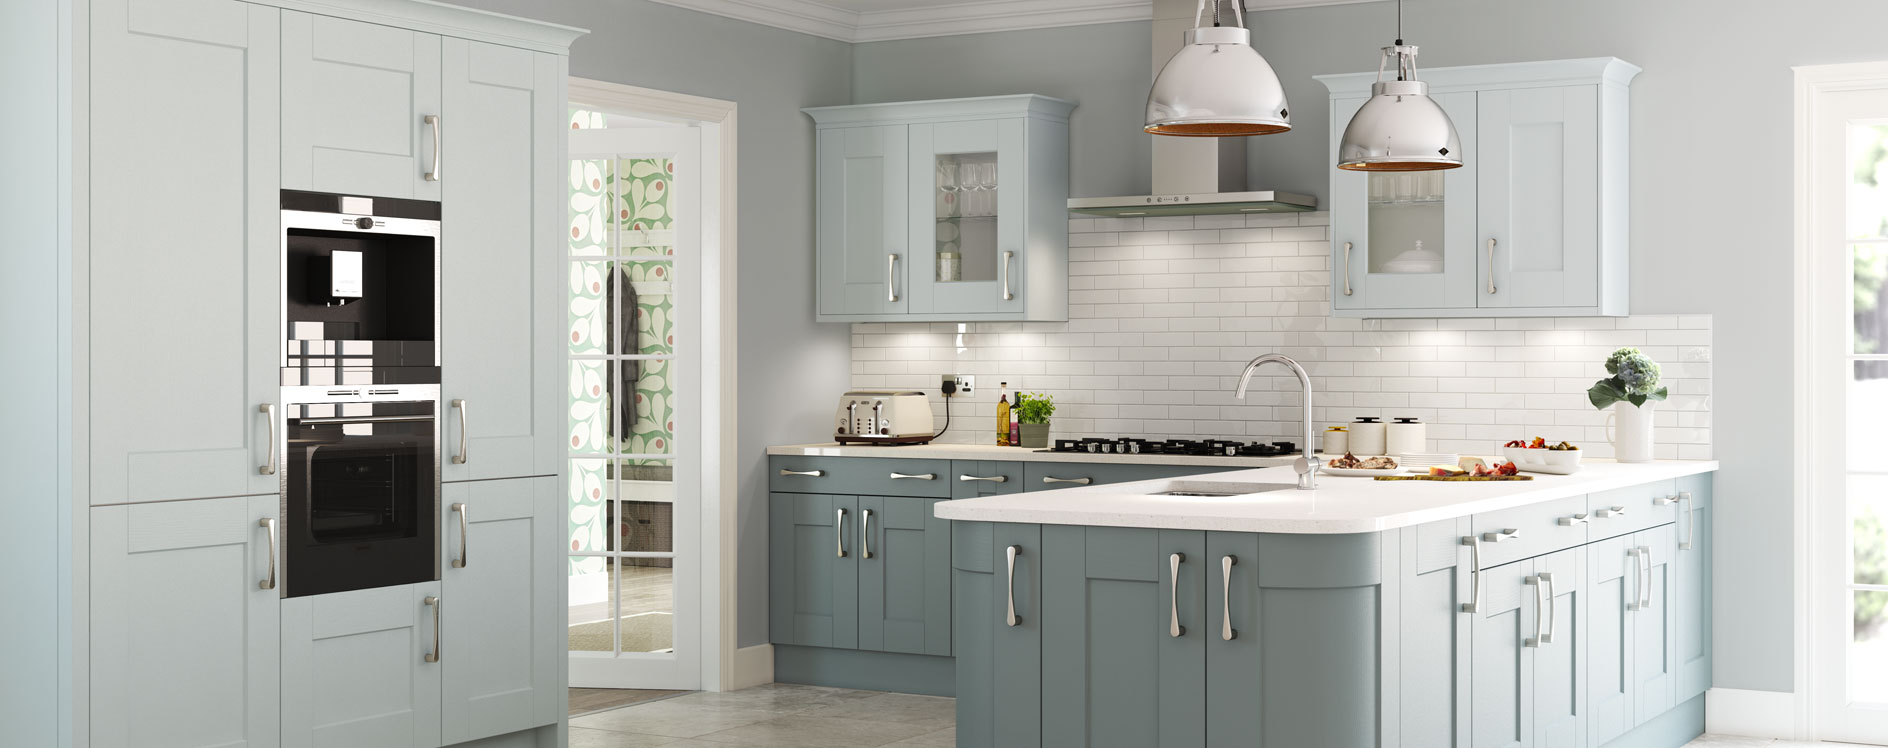 i-Home Kitchens – Nobilia Kitchens & German Kitchens :: Marlow ...